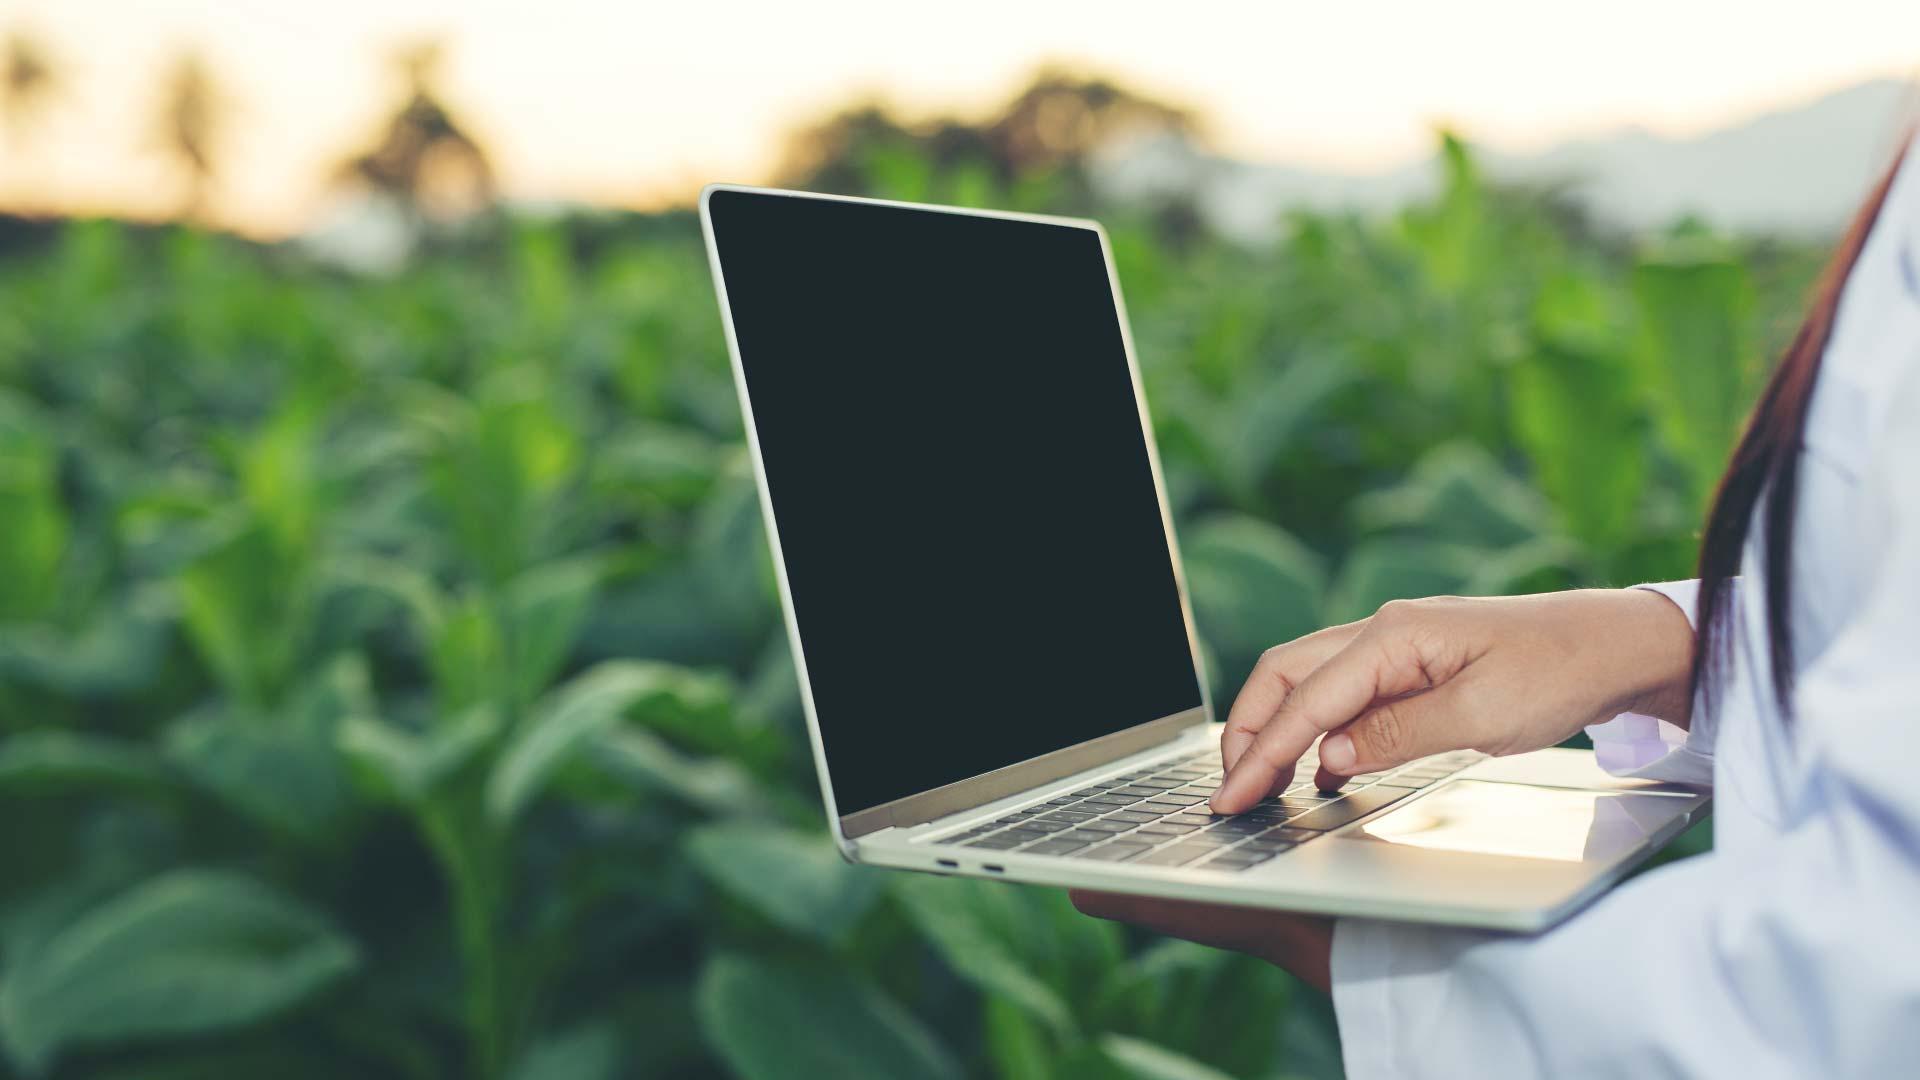 ingeniero agrícola